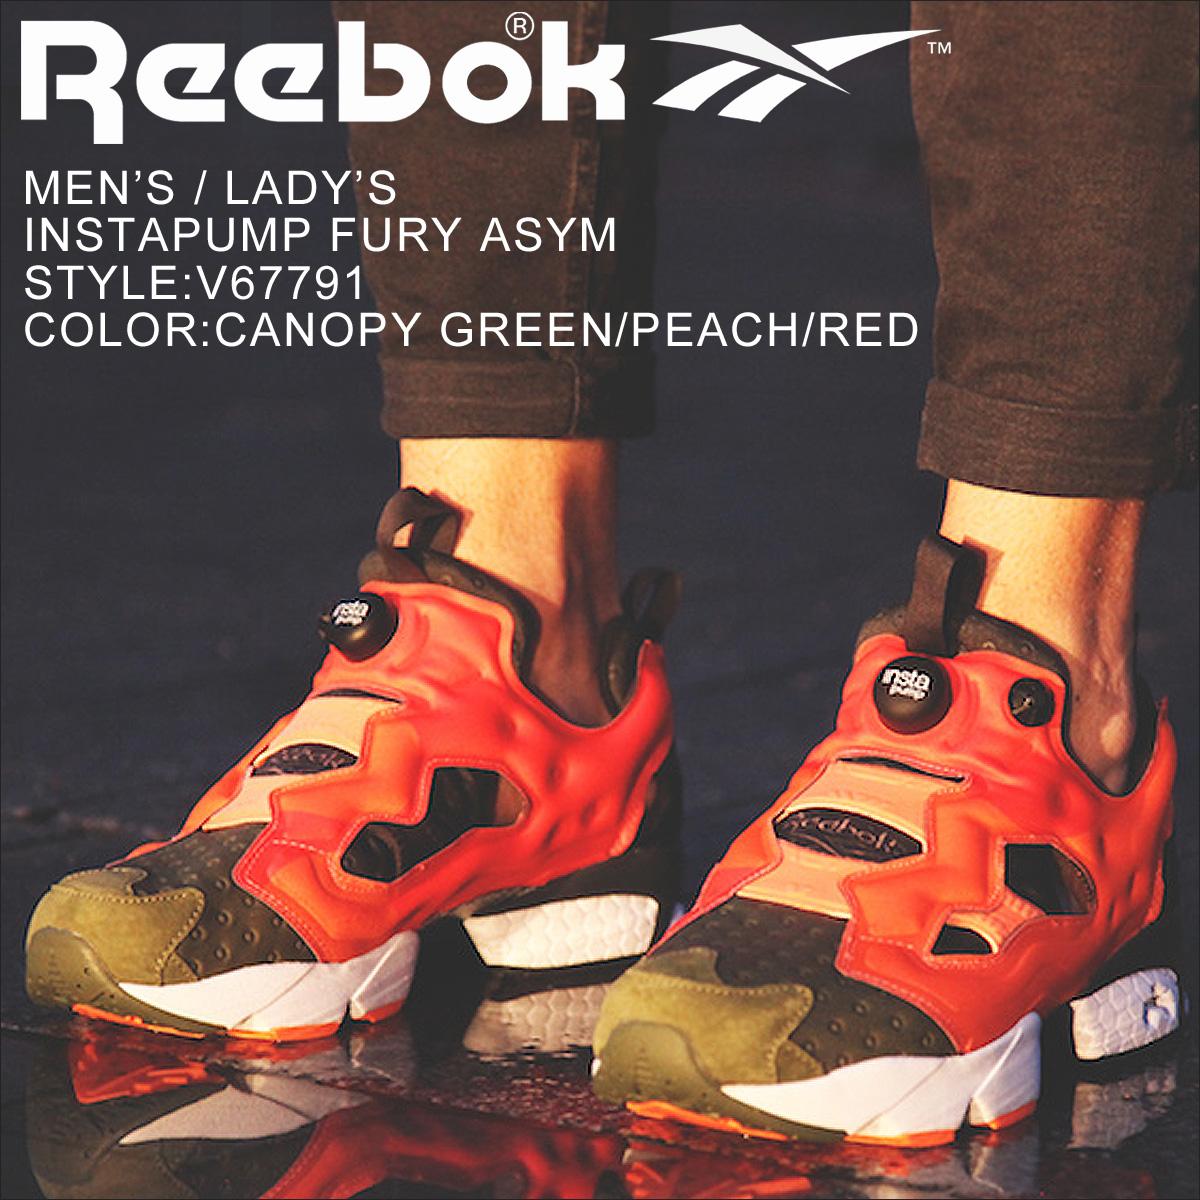 Reebok リーボック ポンプフューリー スニーカー INSTAPUMP FURY ASYM V67791 メンズ レディース 靴 オレンジ